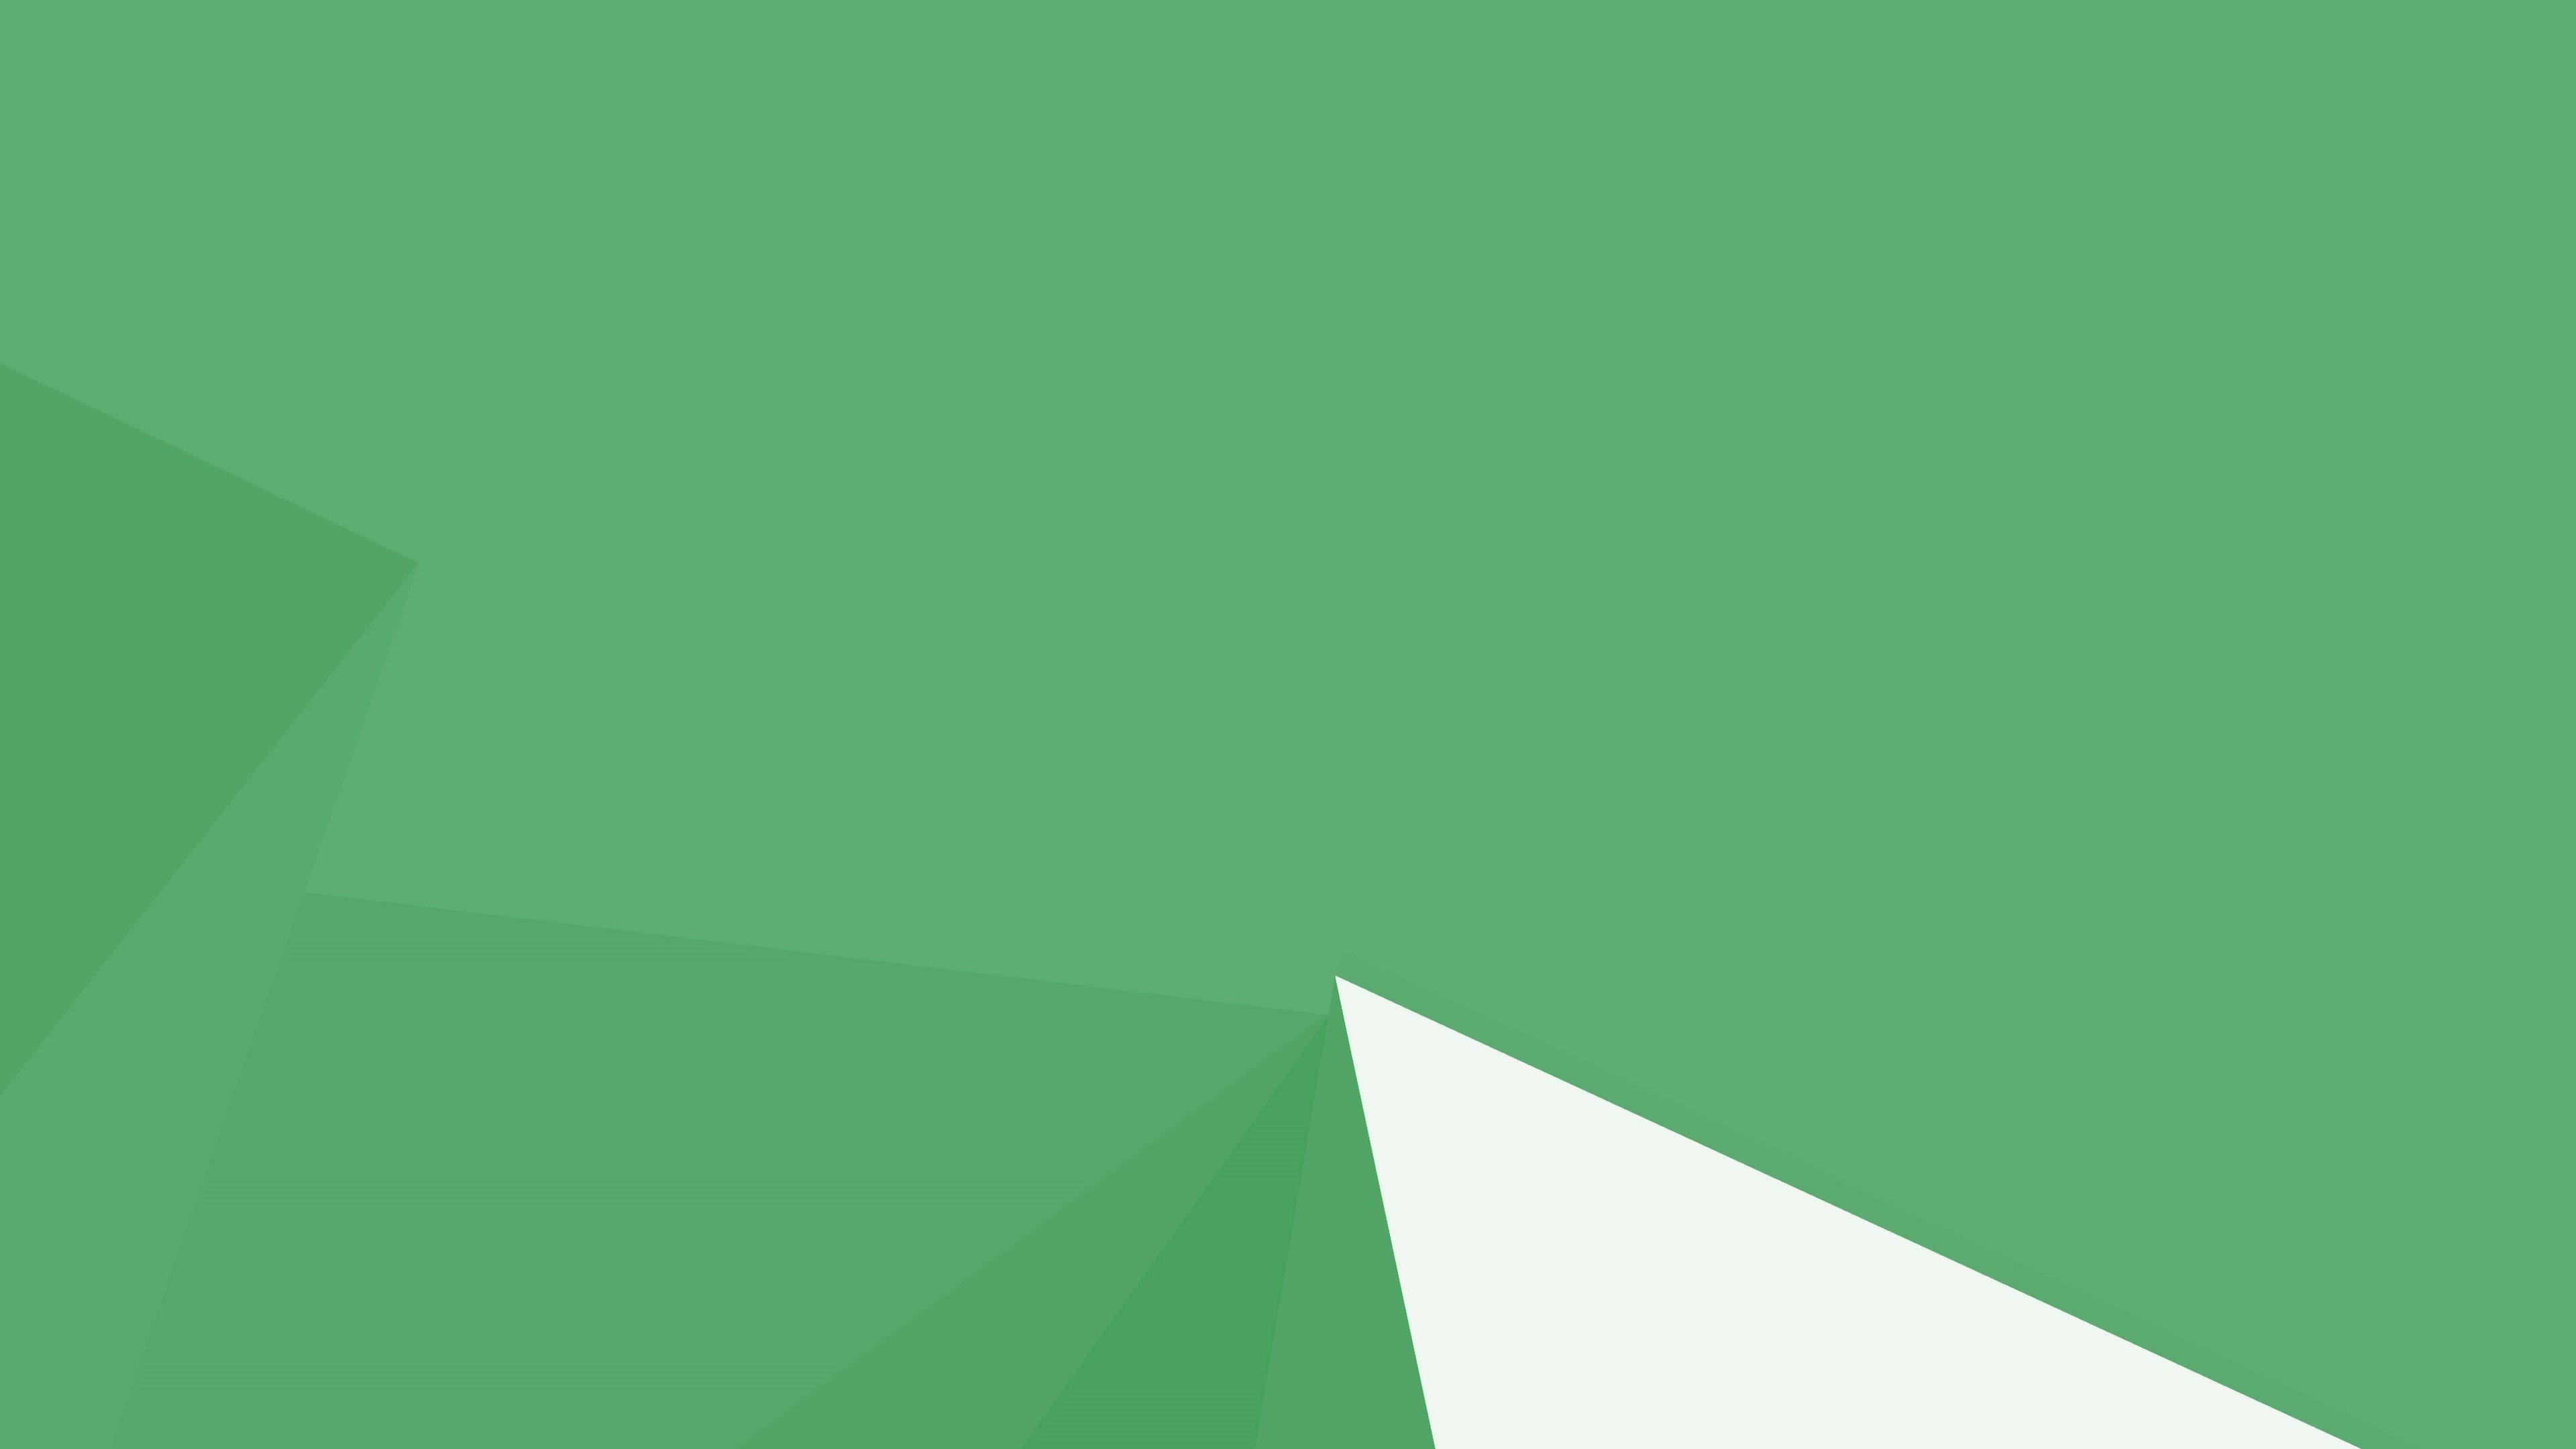 48 Windows 81 Green Wallpaper On Wallpapersafari